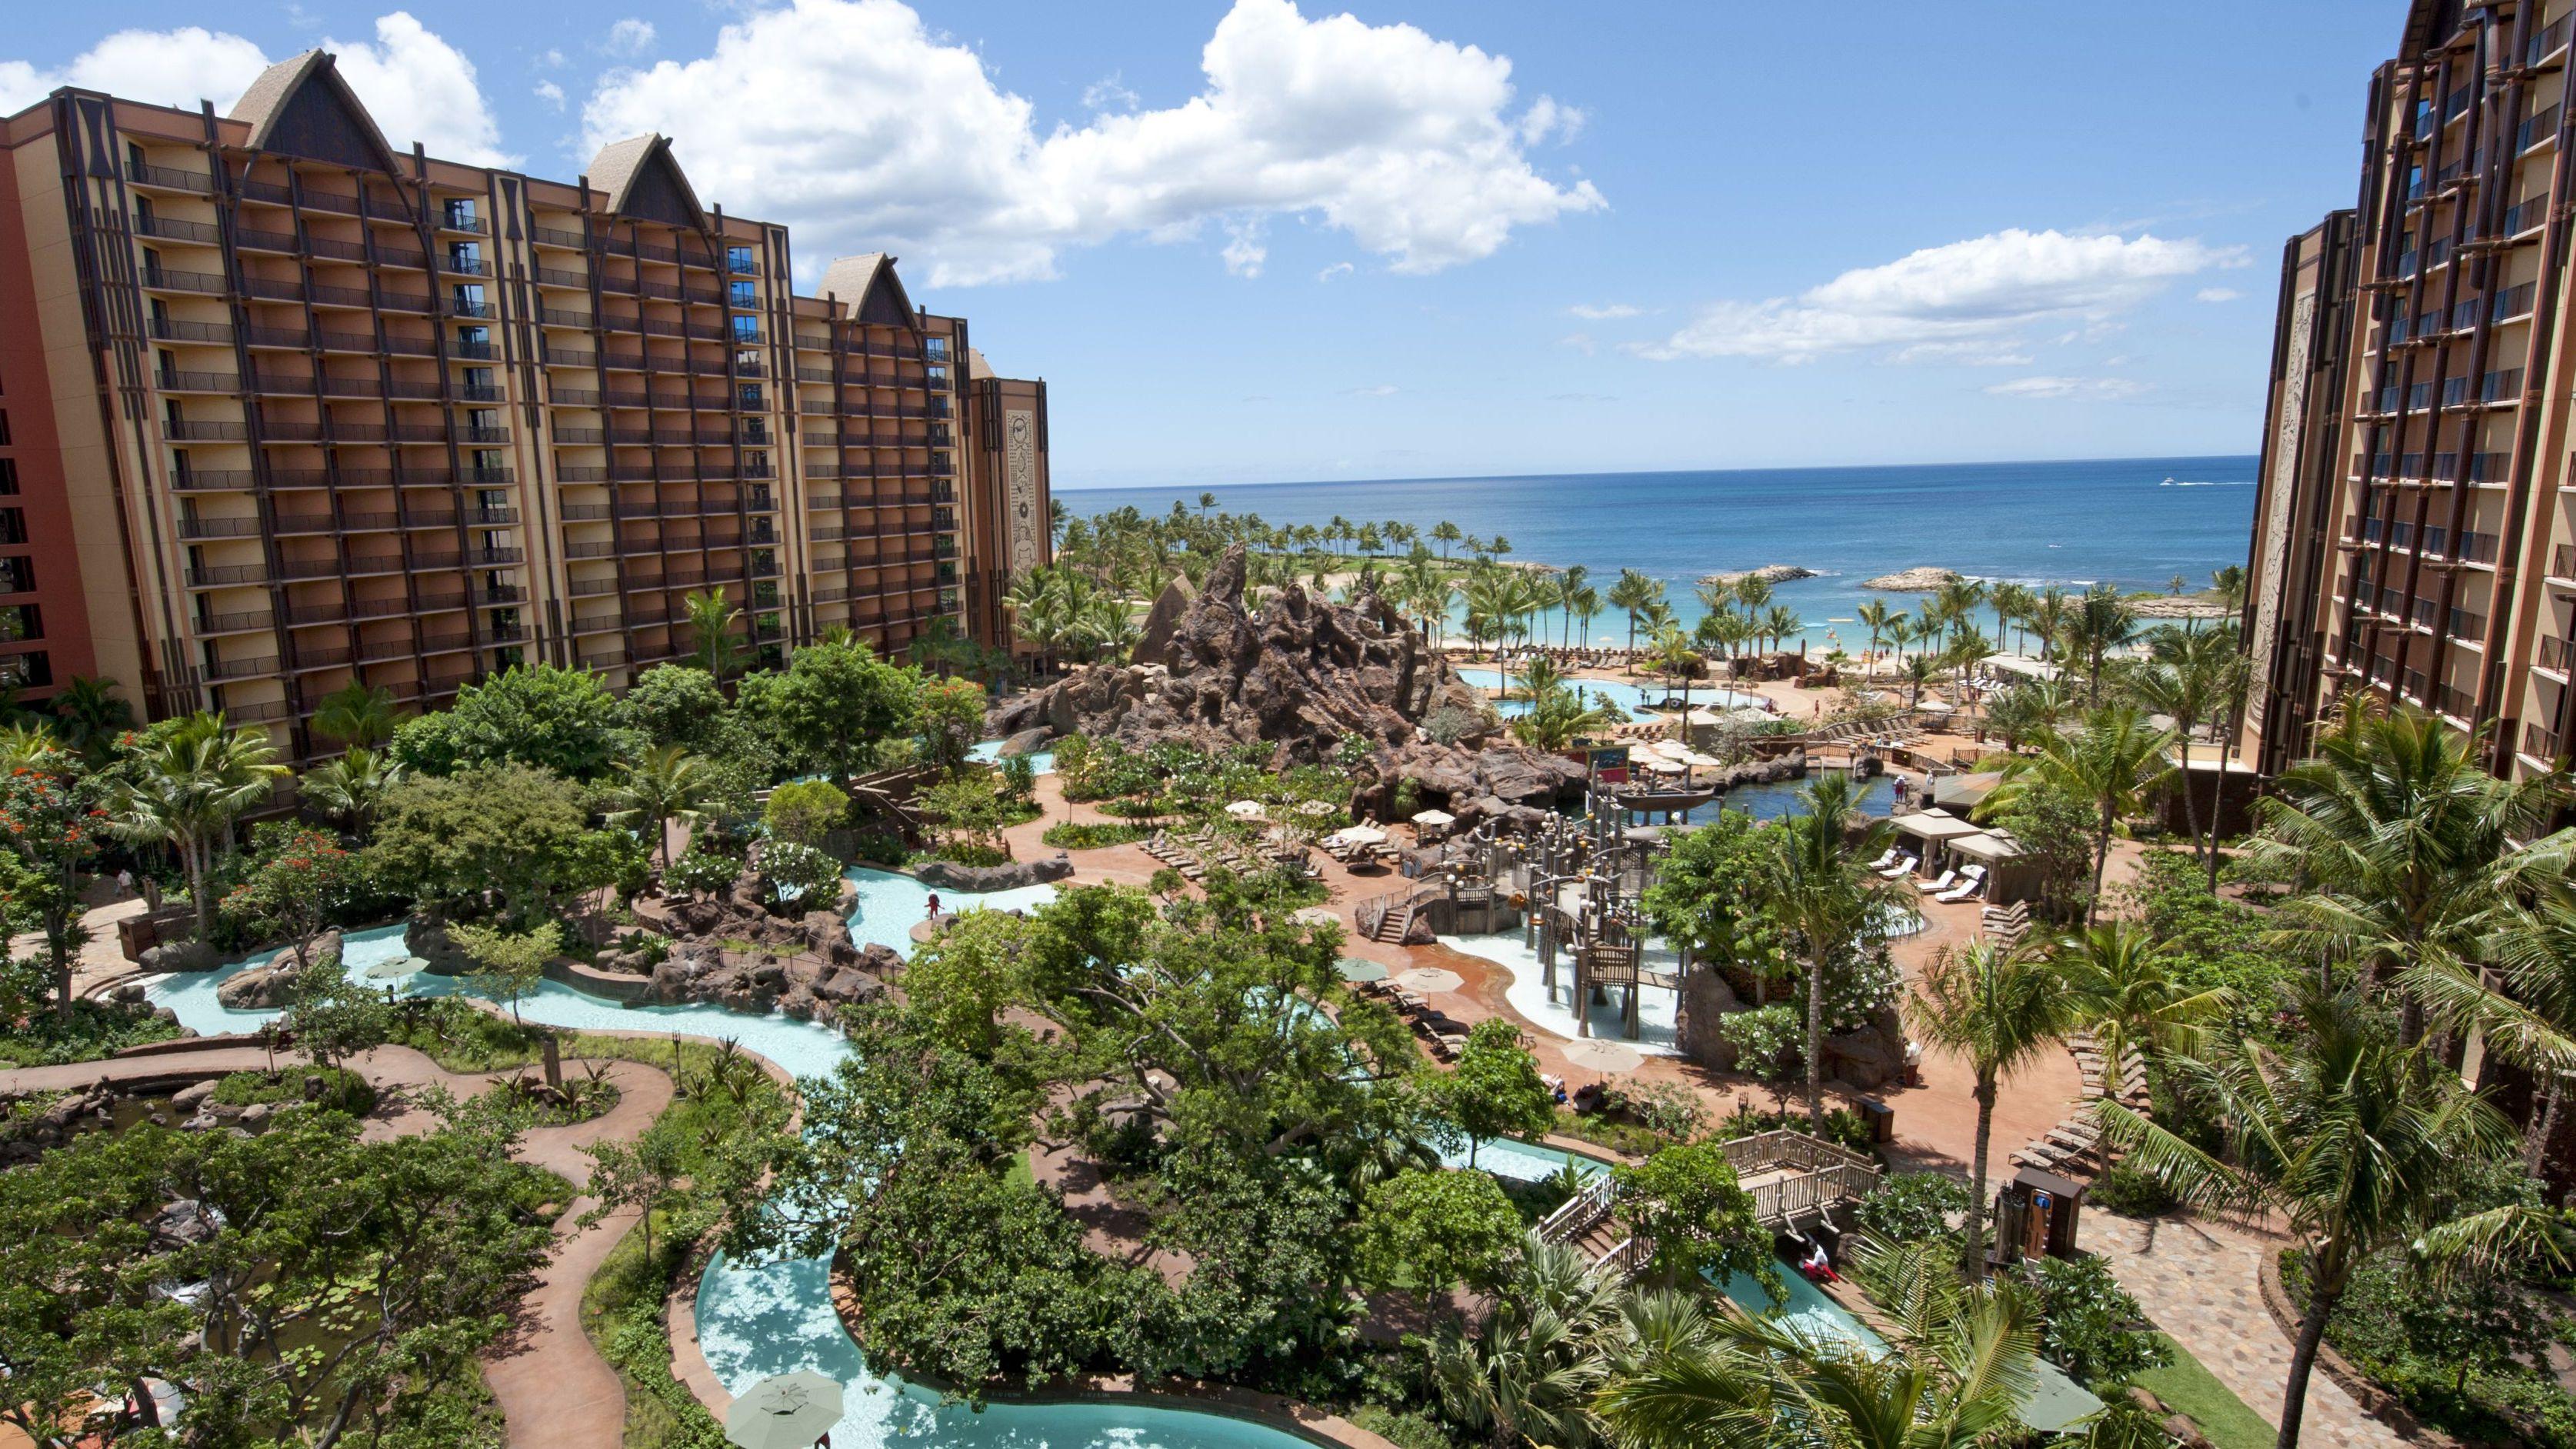 Reasons To Visit Disney S Aulani In Hawaii